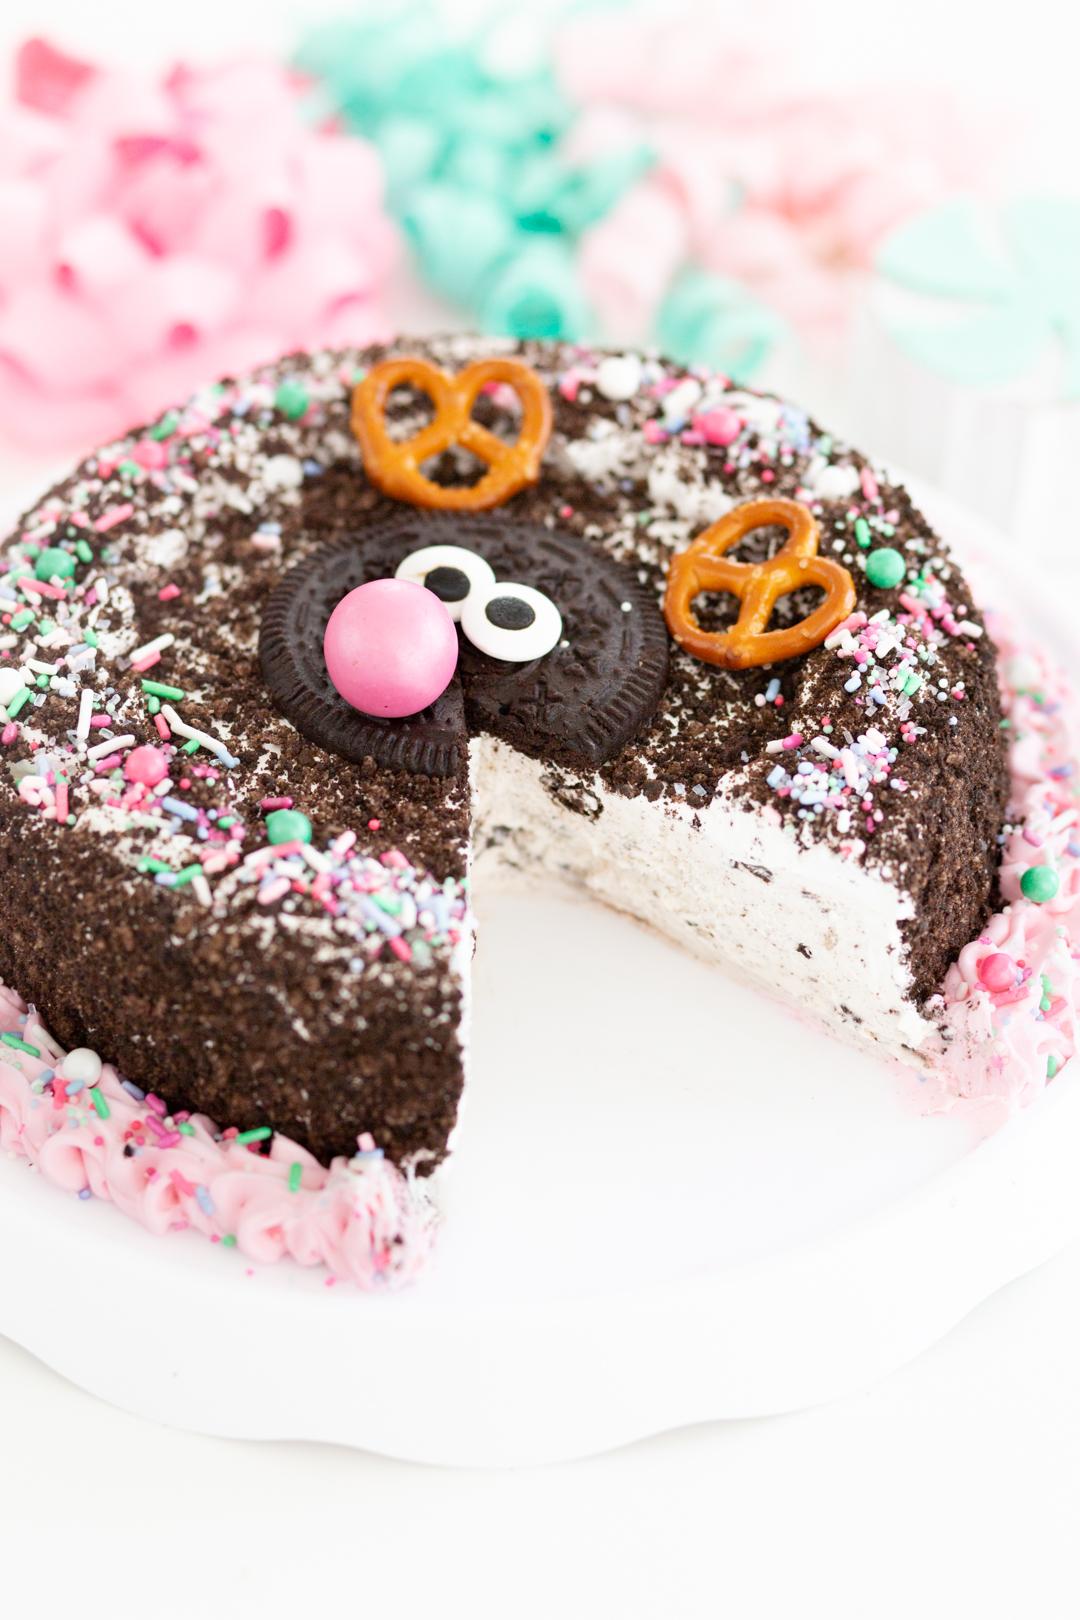 ice cream cake with slice removed